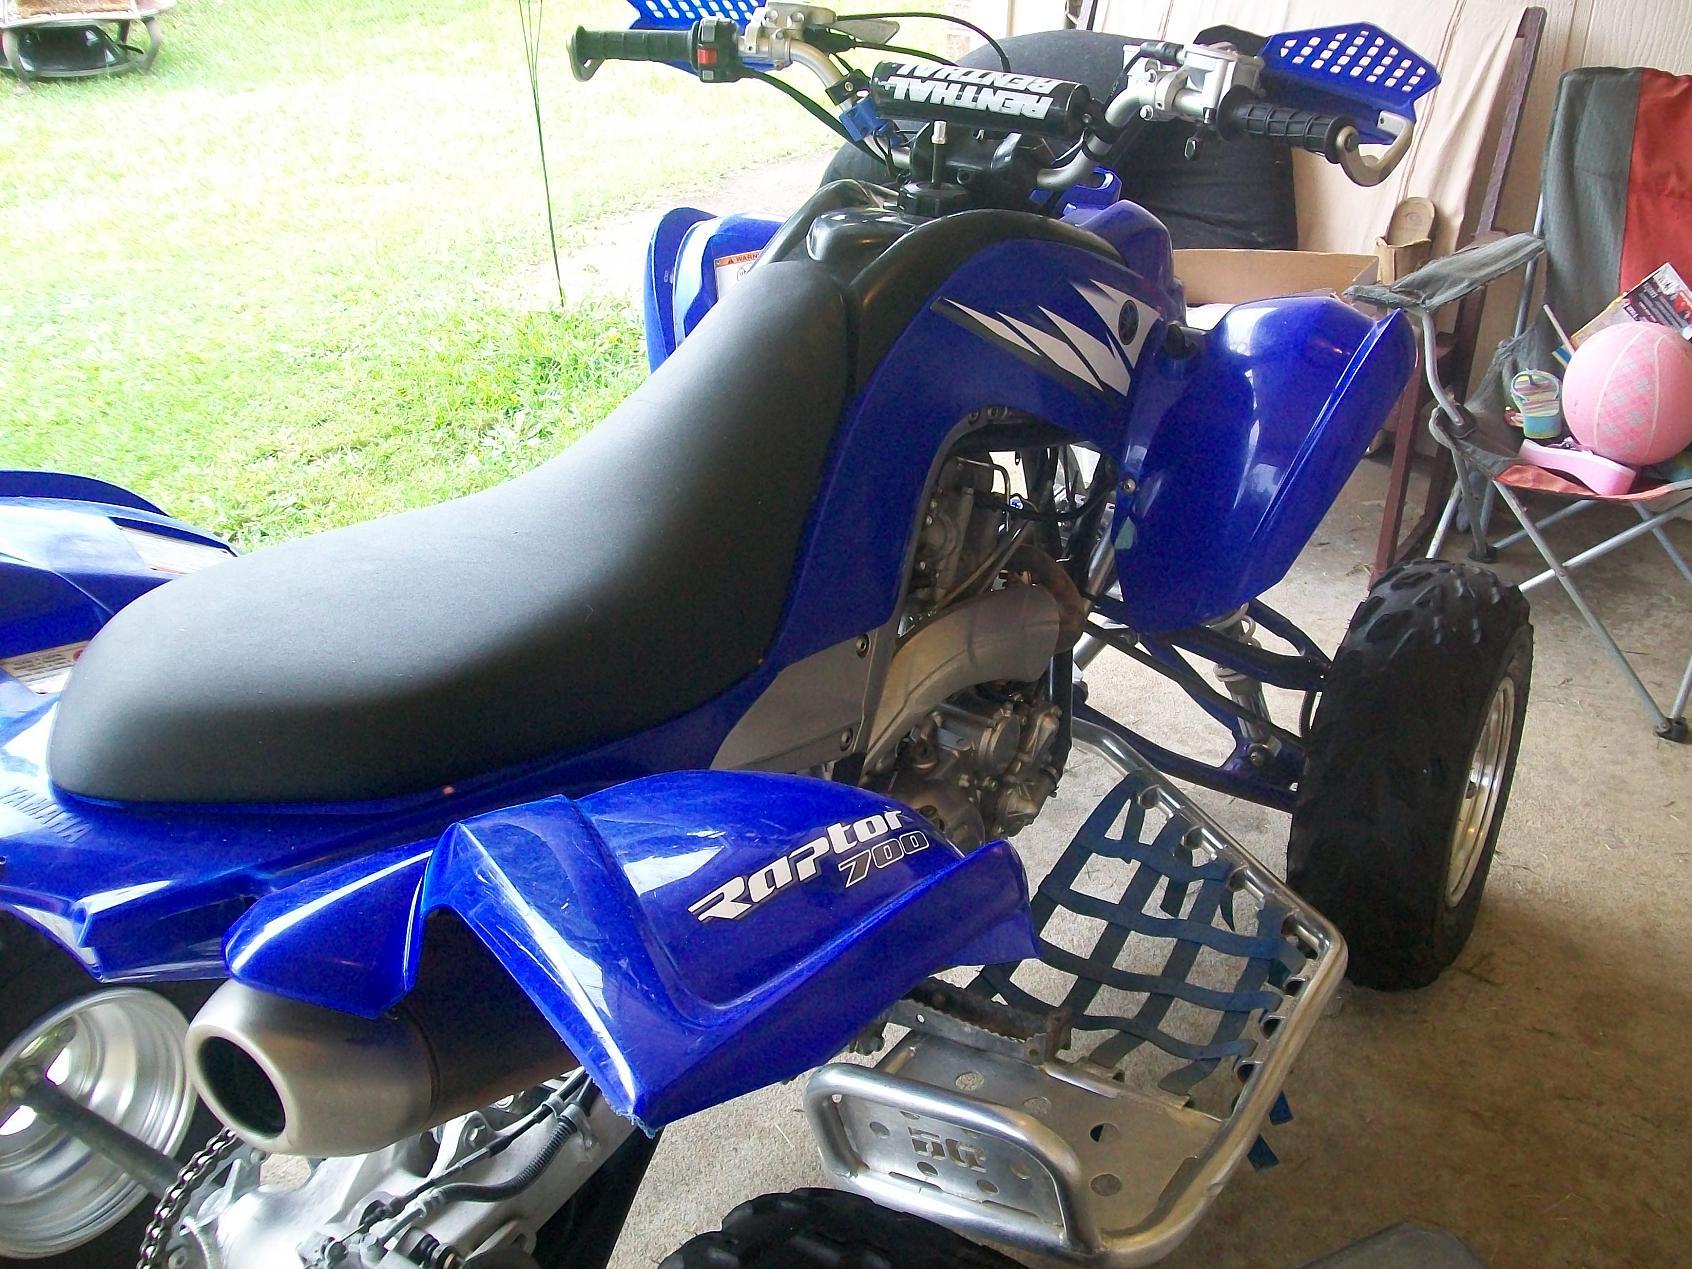 Yamaha Raptor 700 For Sale >> 2006 yamaha raptor 700 efi - R/C Tech Forums